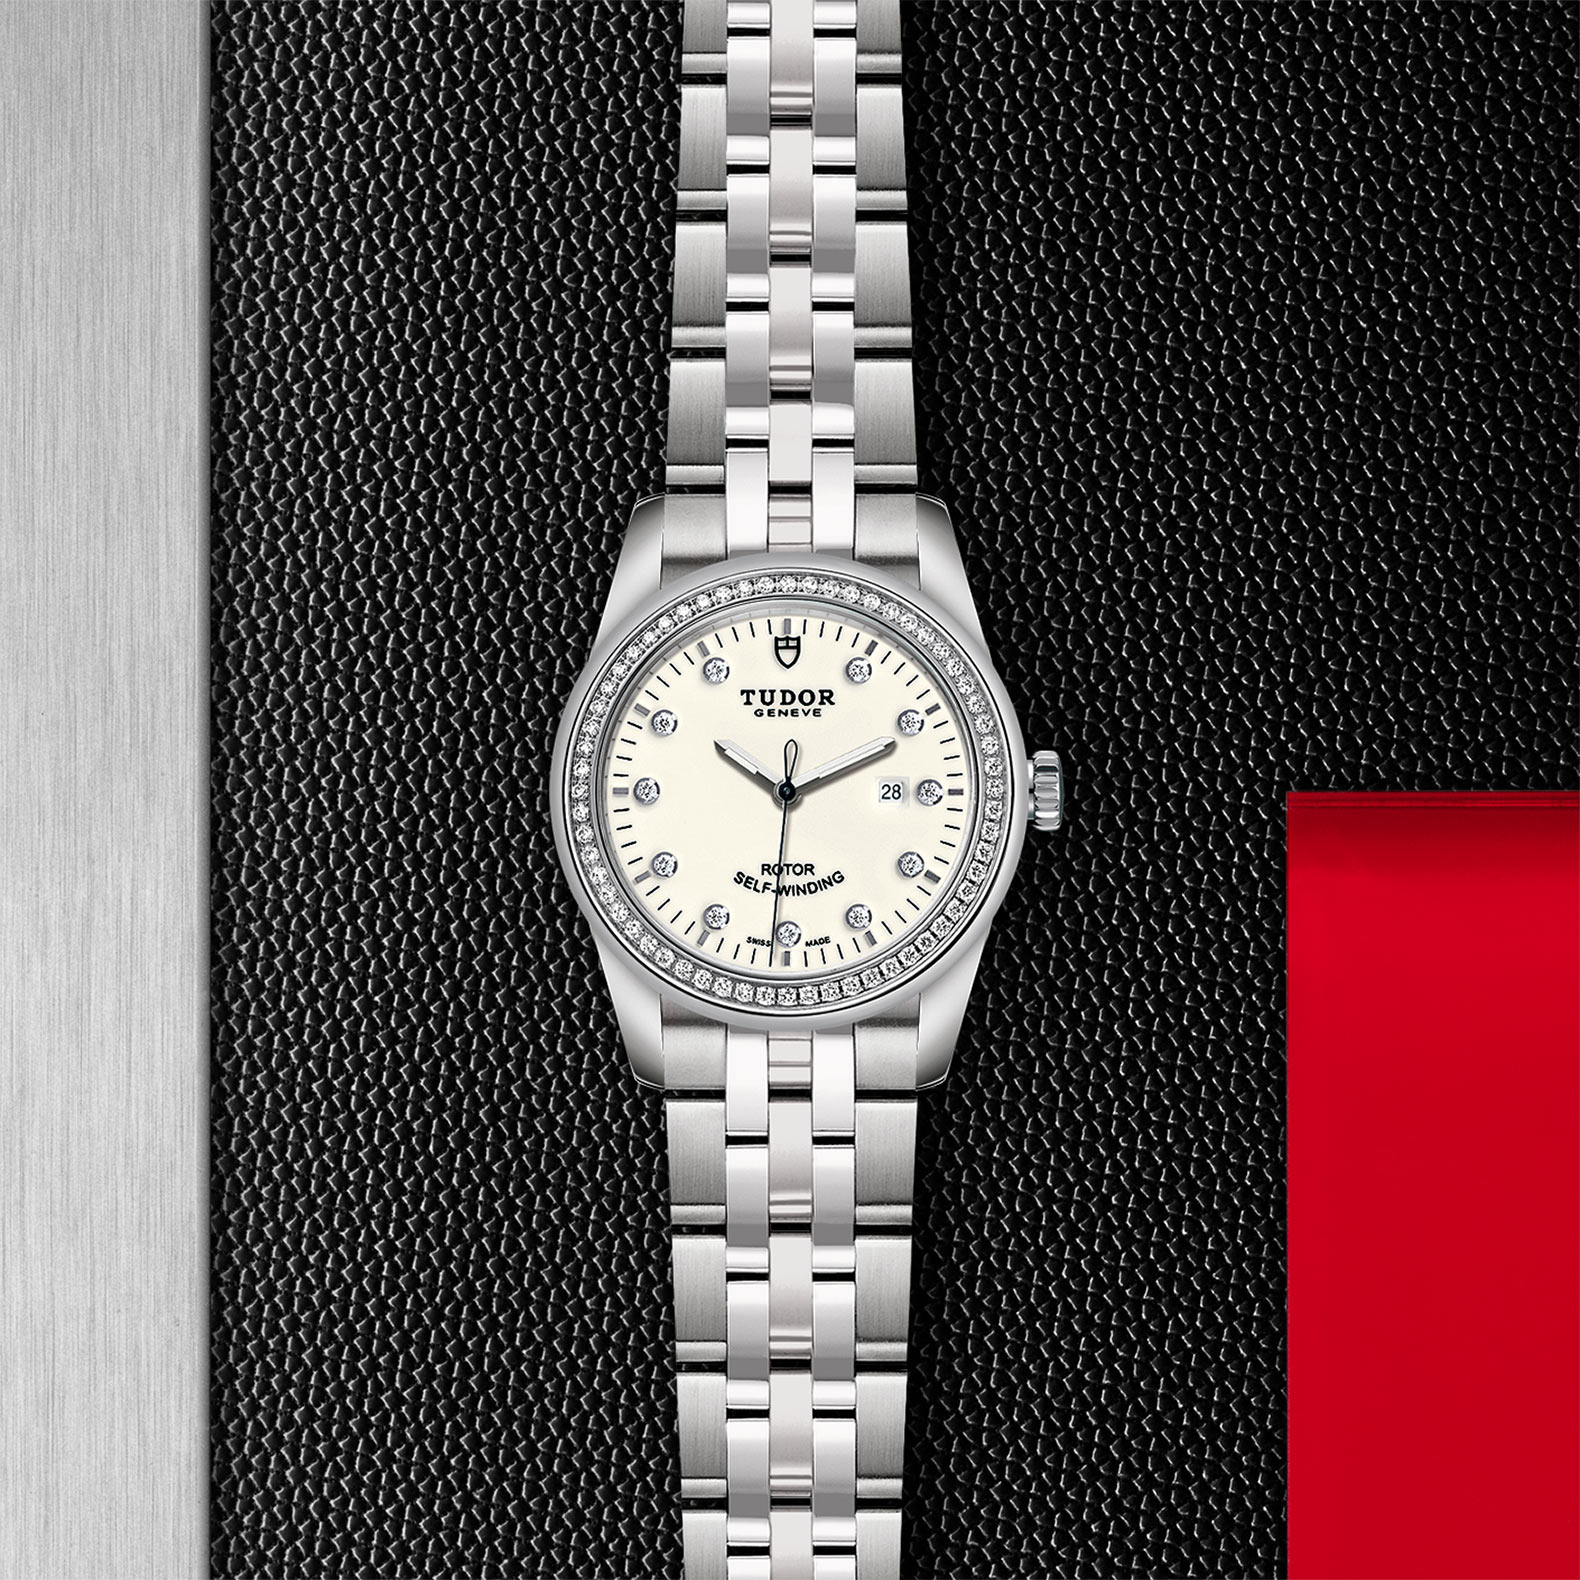 TUDOR Glamour Date - M53020-0074